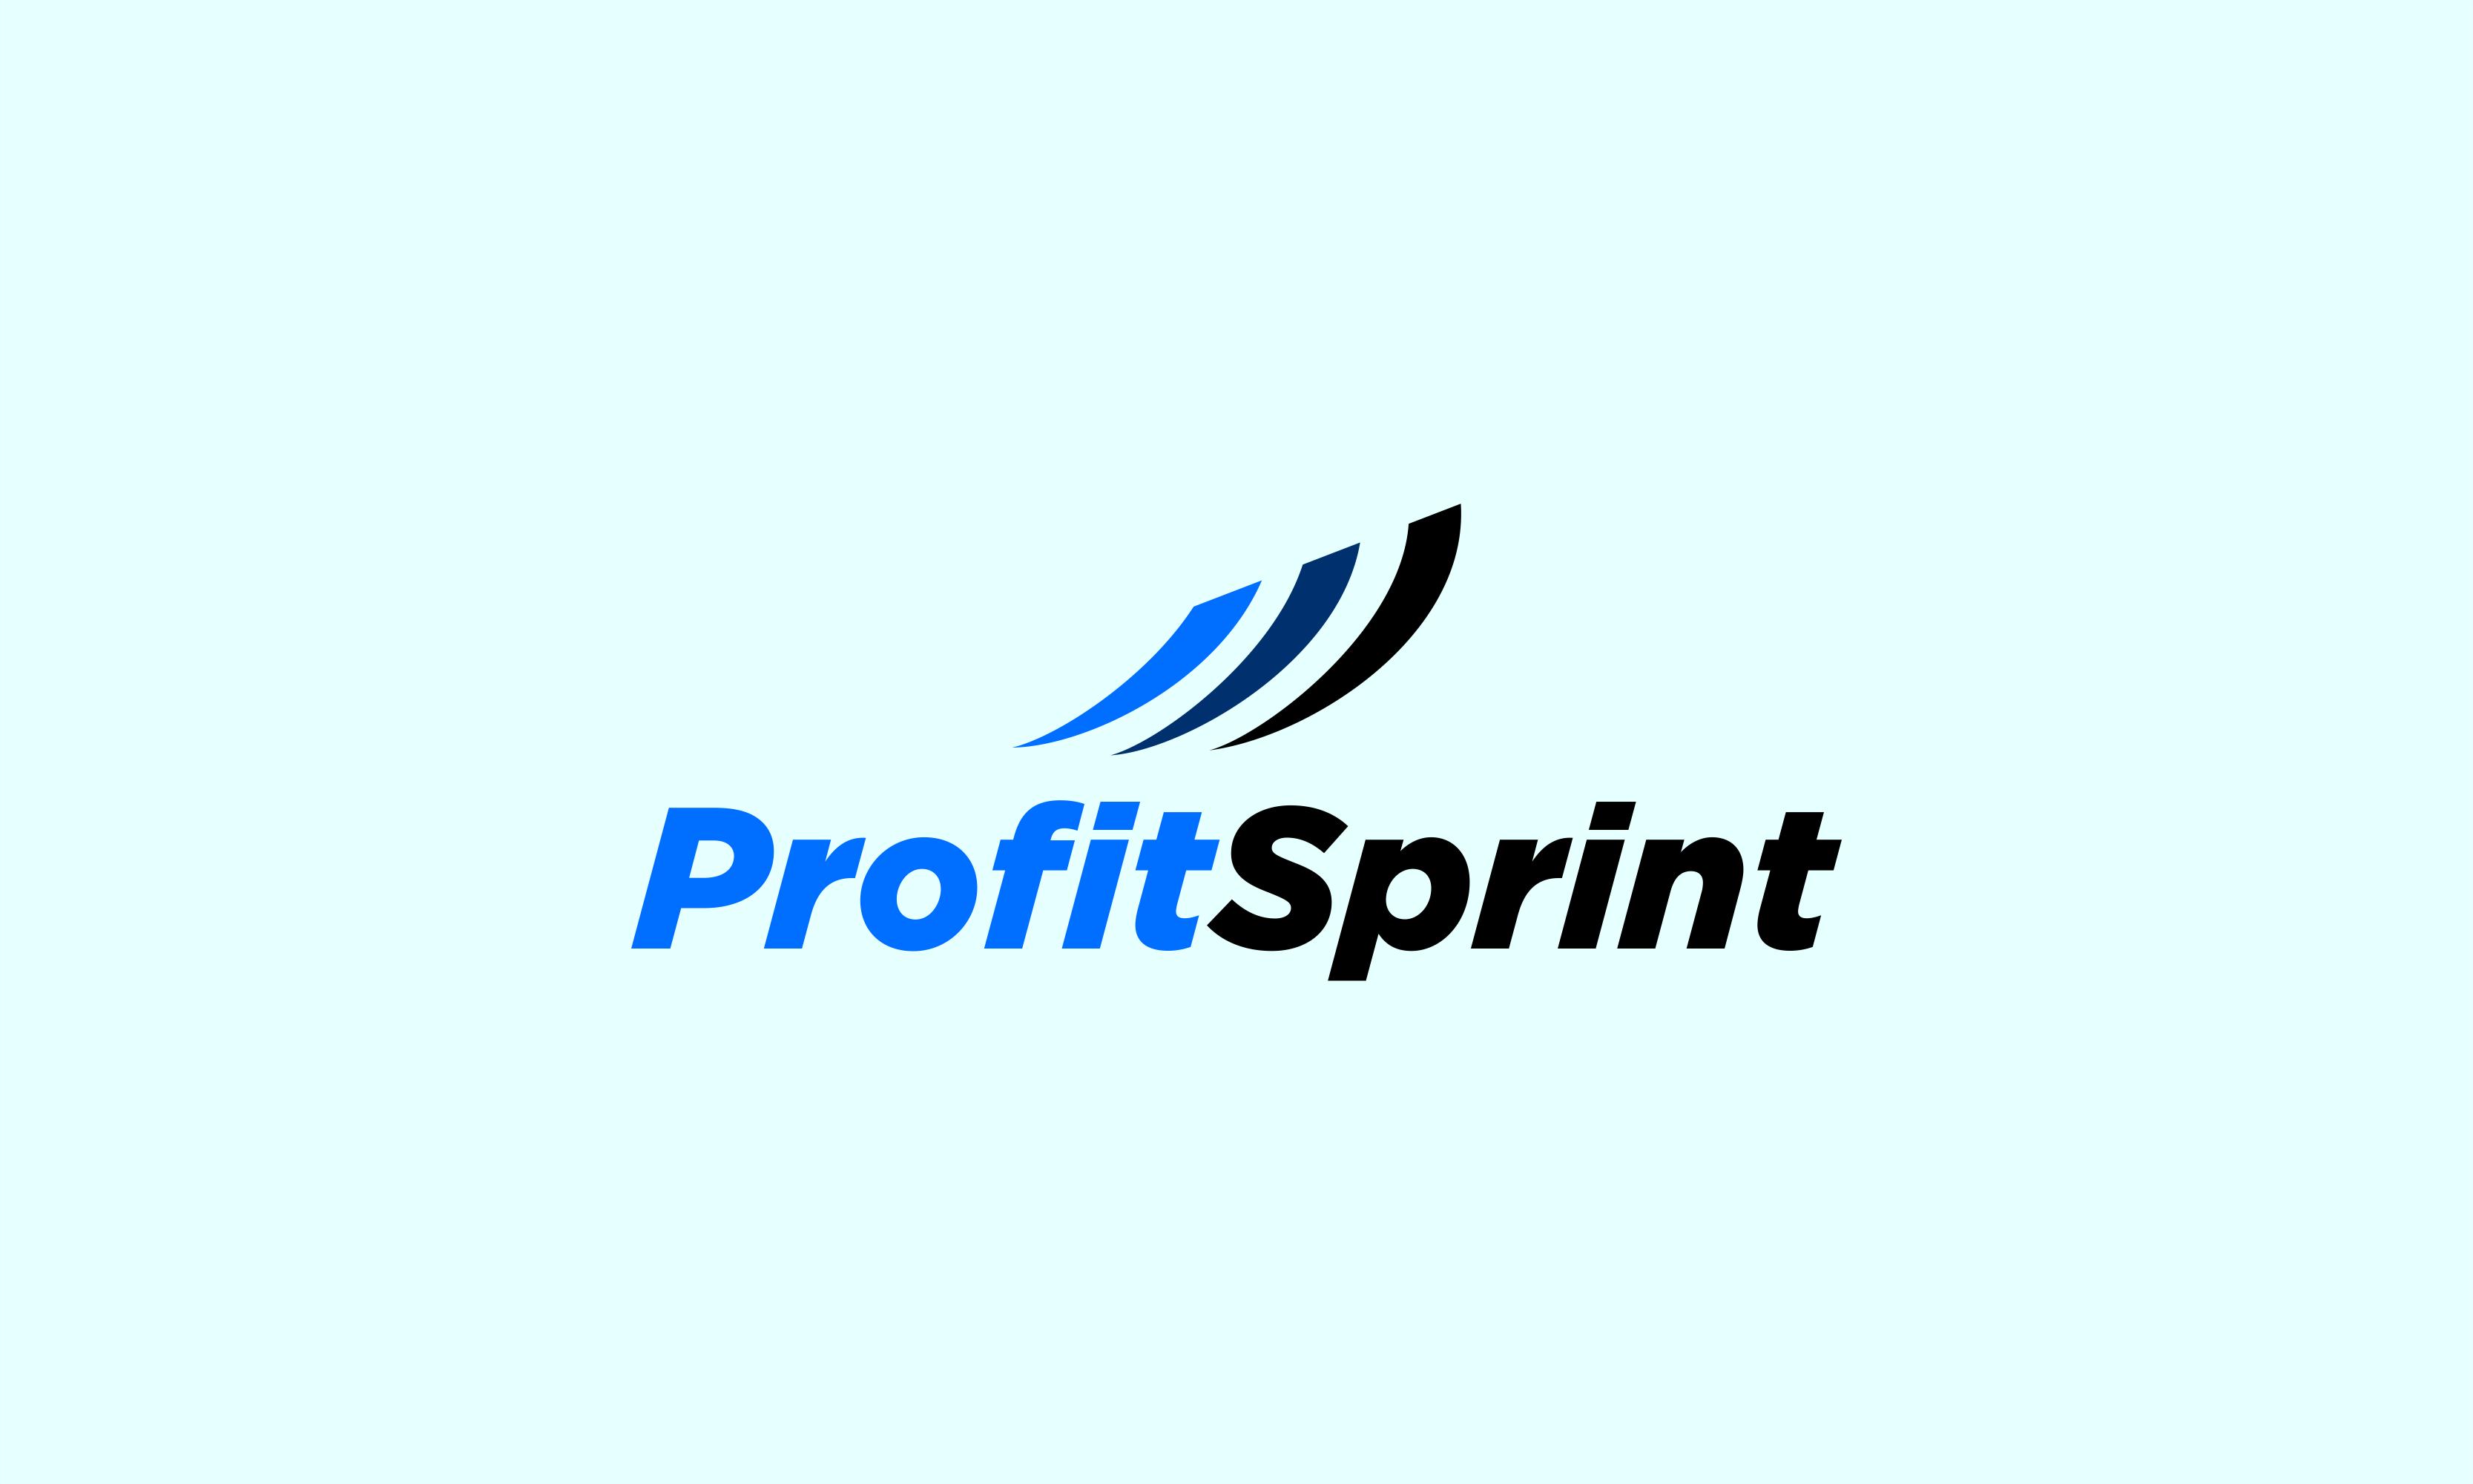 Profitsprint